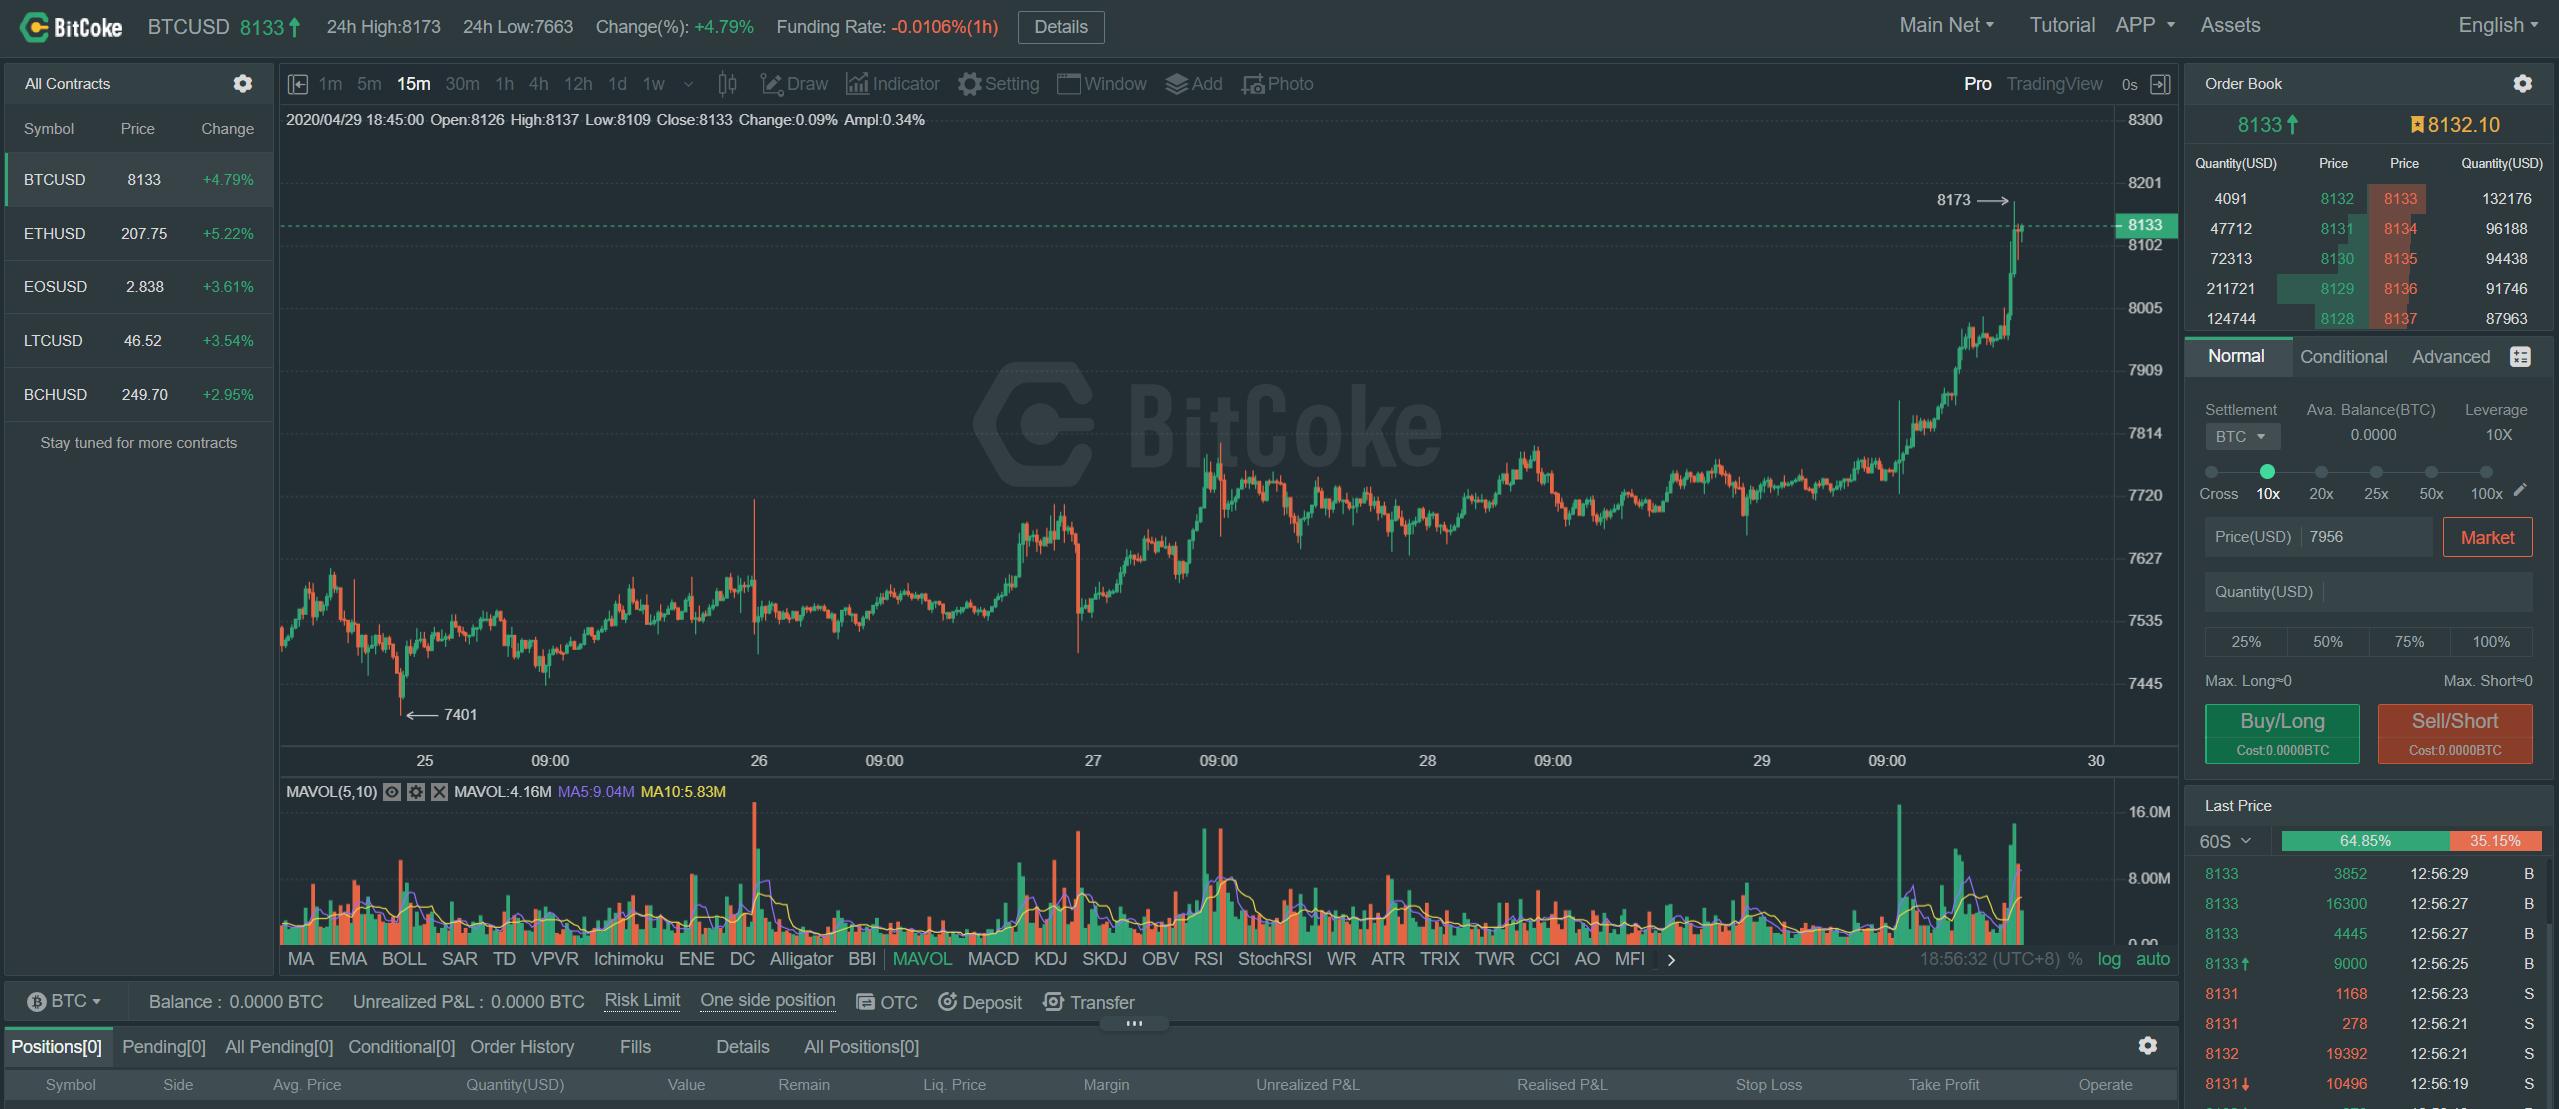 BitCoke Trading View